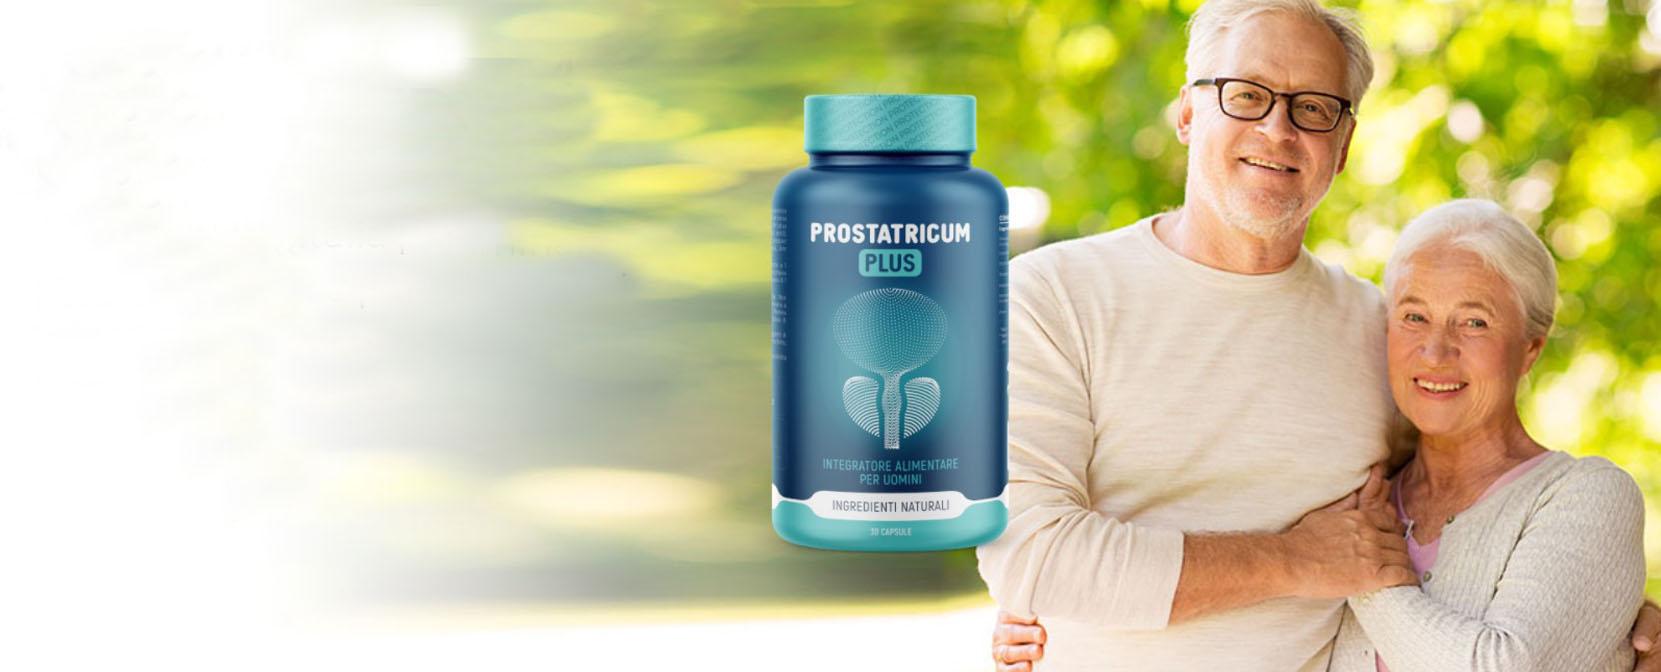 Prostatricum Plus integratore alimentare per la prostata